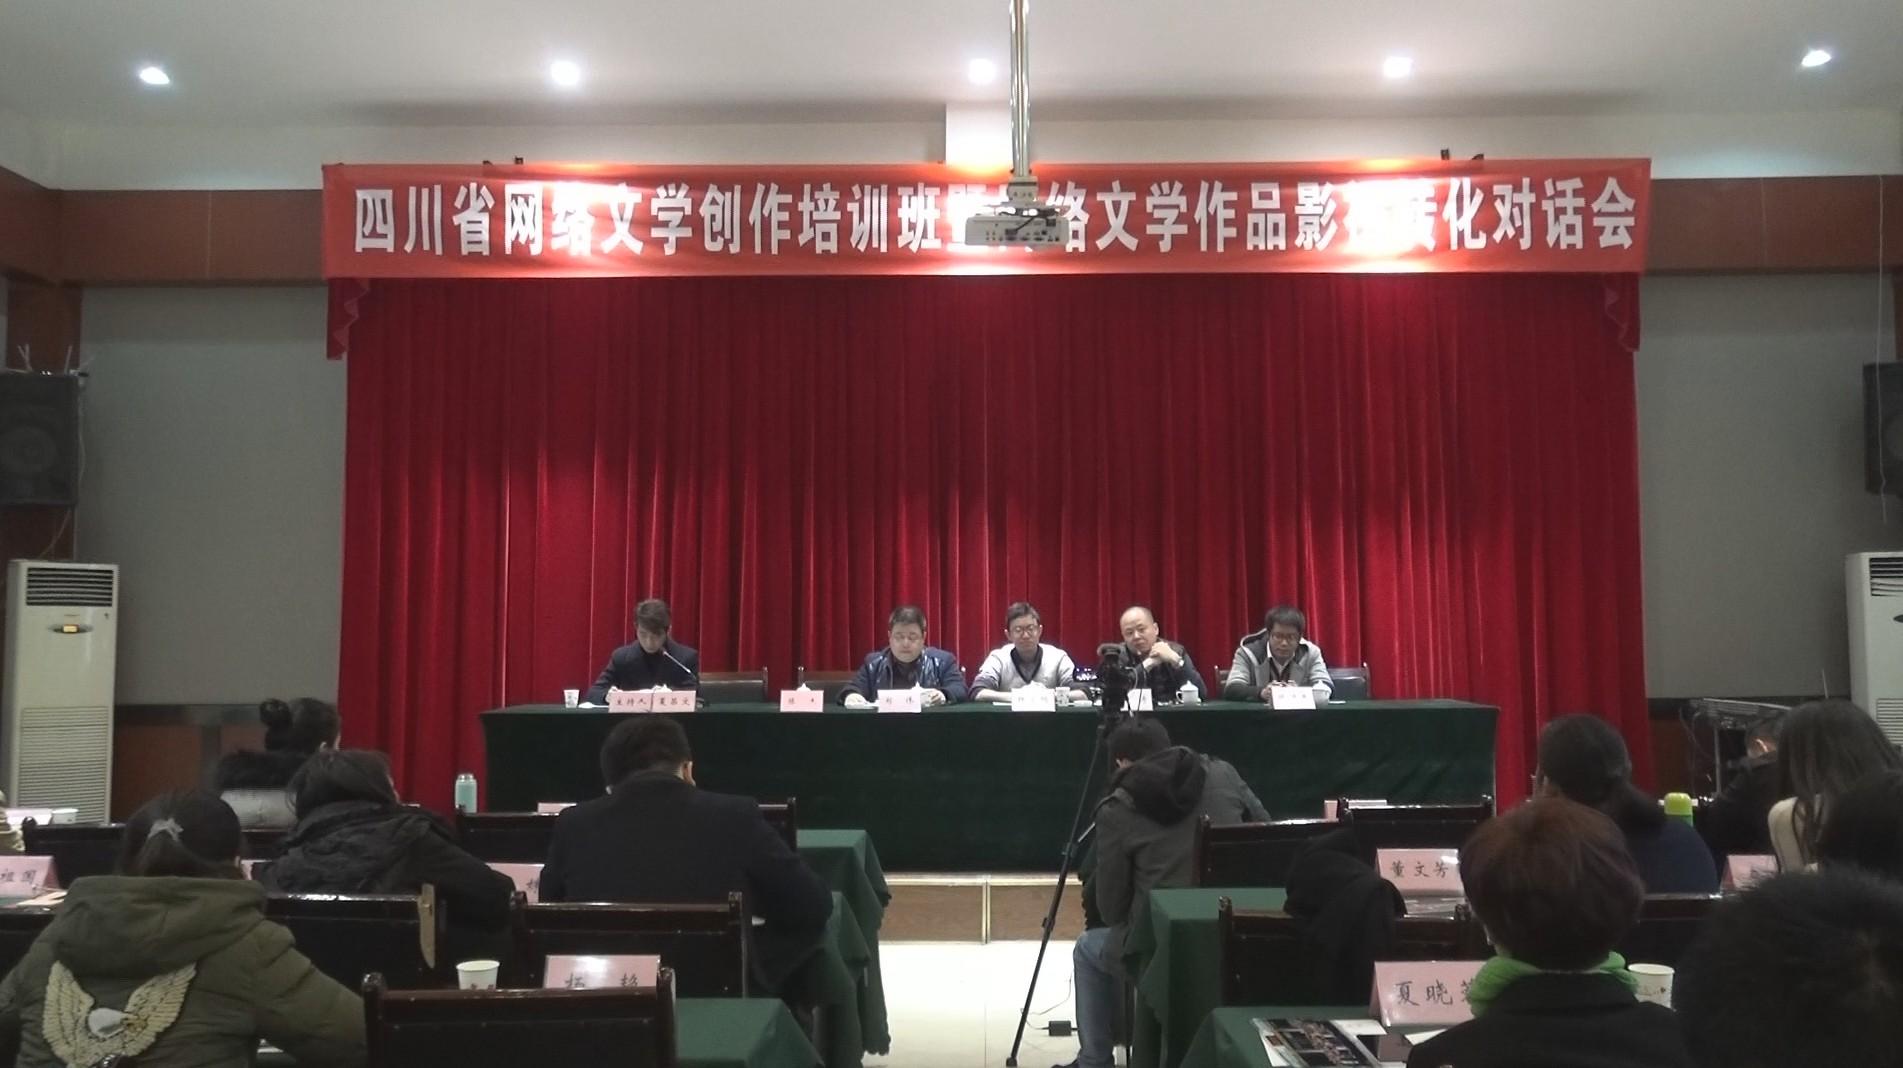 bob体育平台app省网络文学创作培训班暨网络